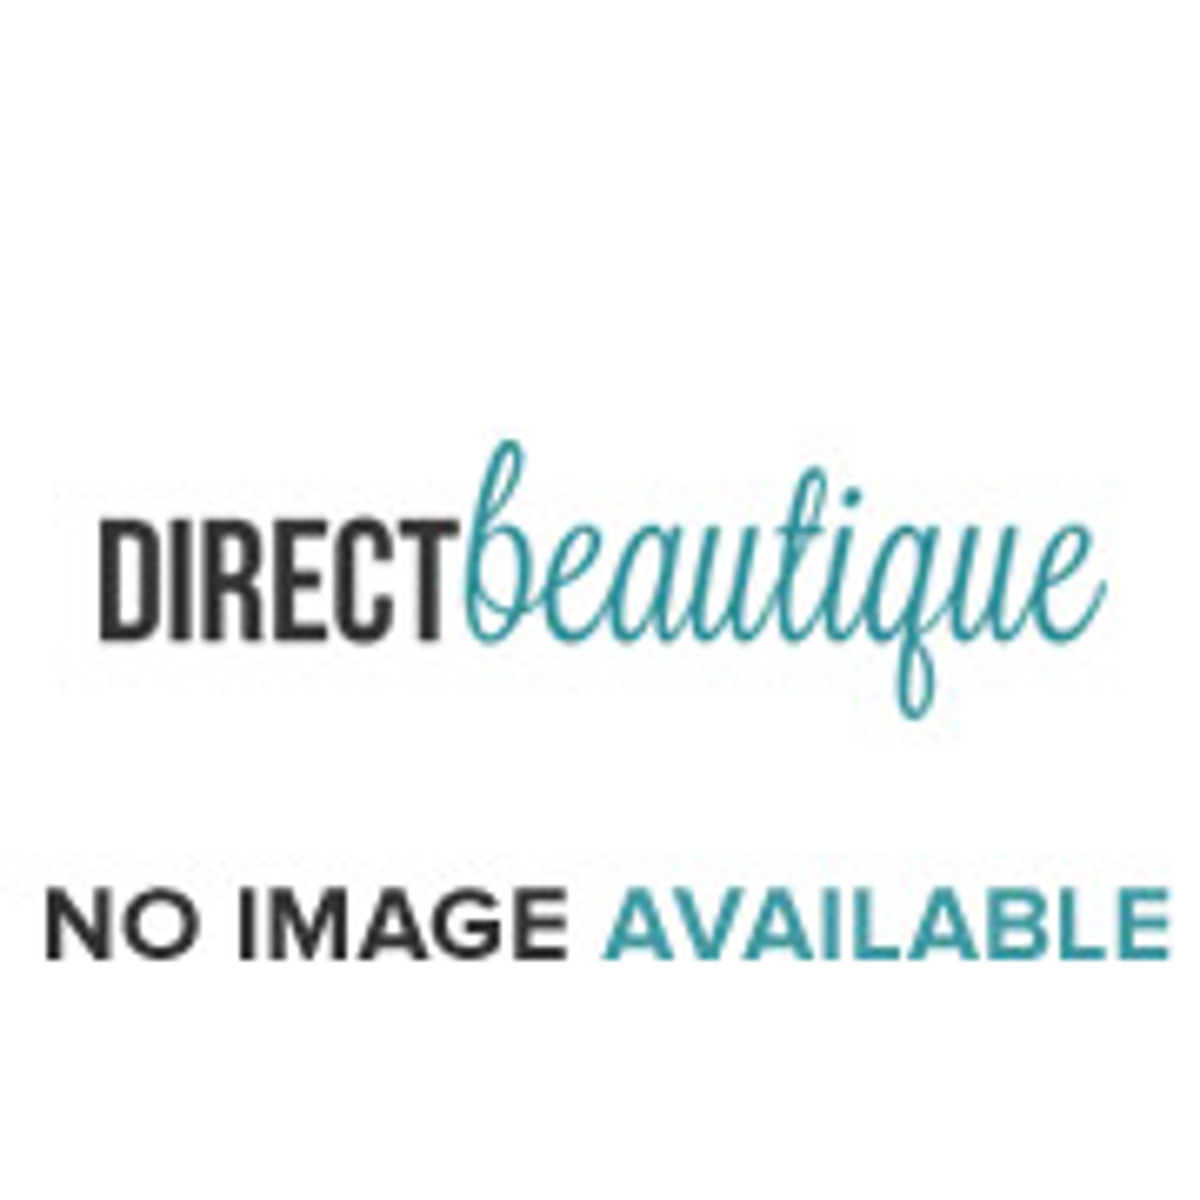 Replay Relover EDT Spray 50ml